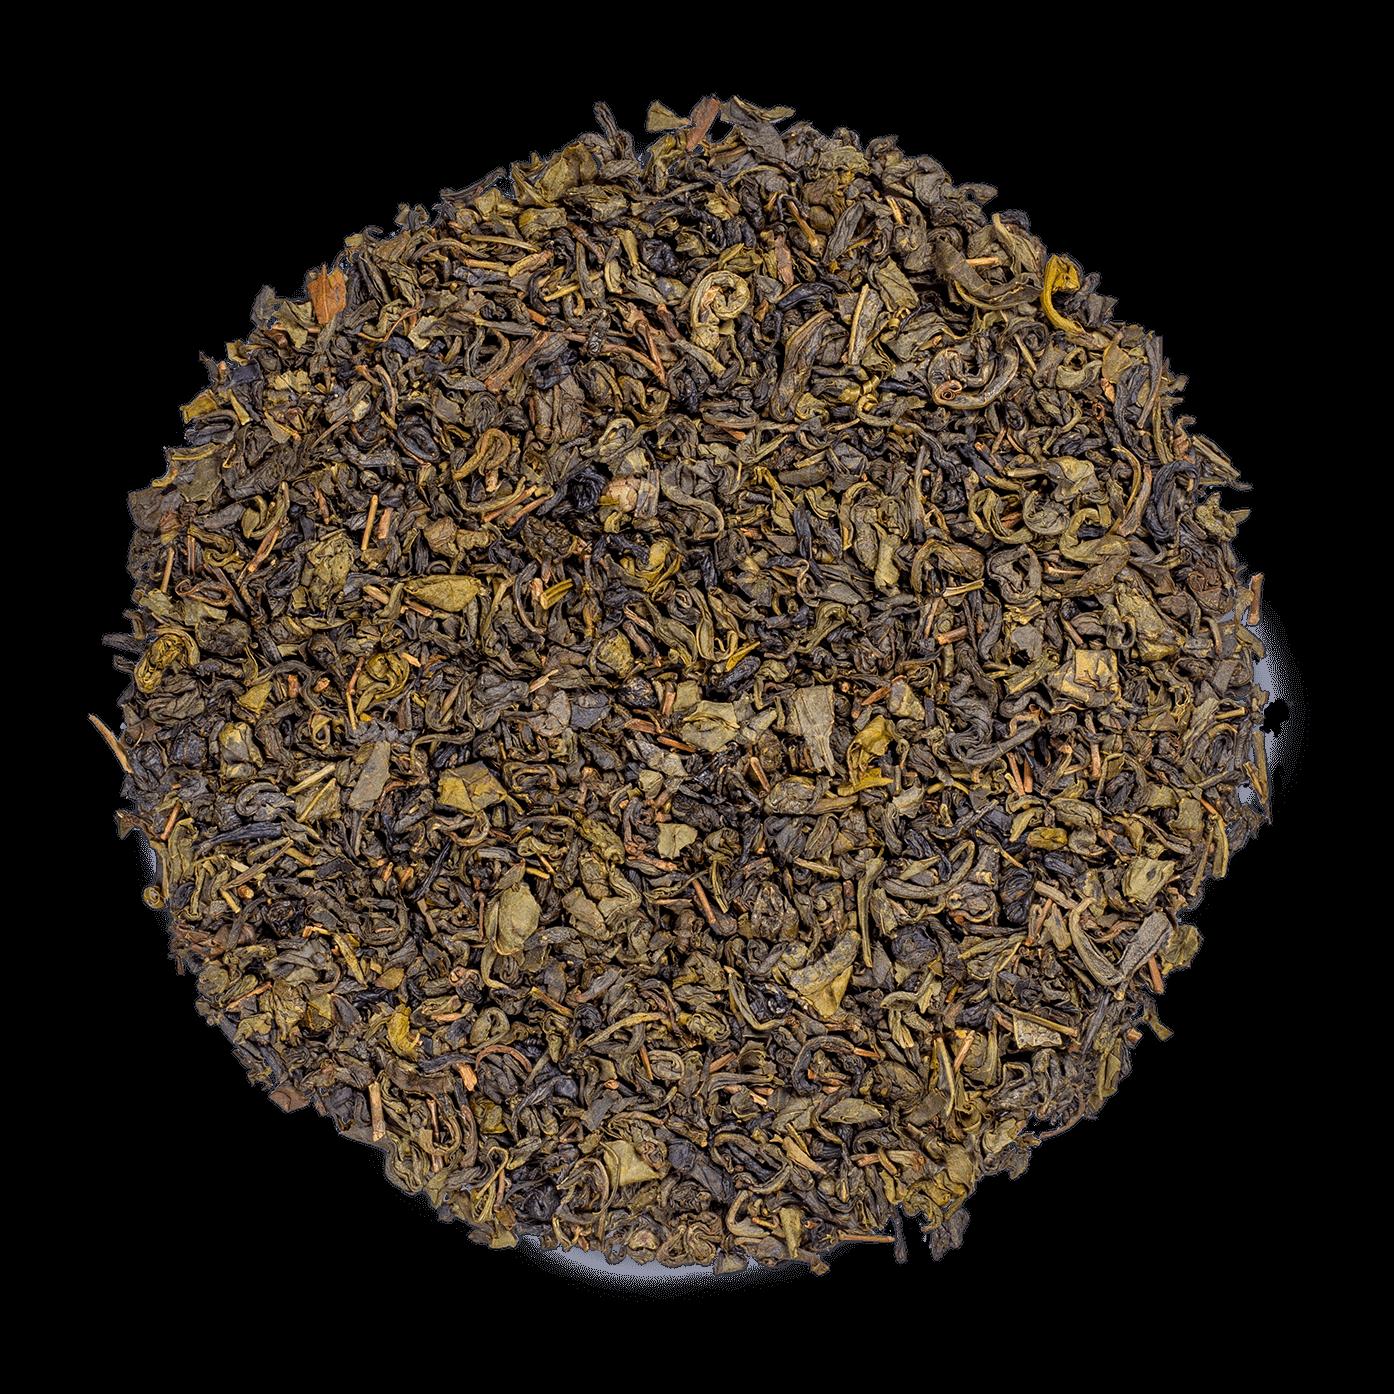 Vert Bouquet bio - Thé vert, bergamote, fleur - Thé en vrac - Kusmi Tea